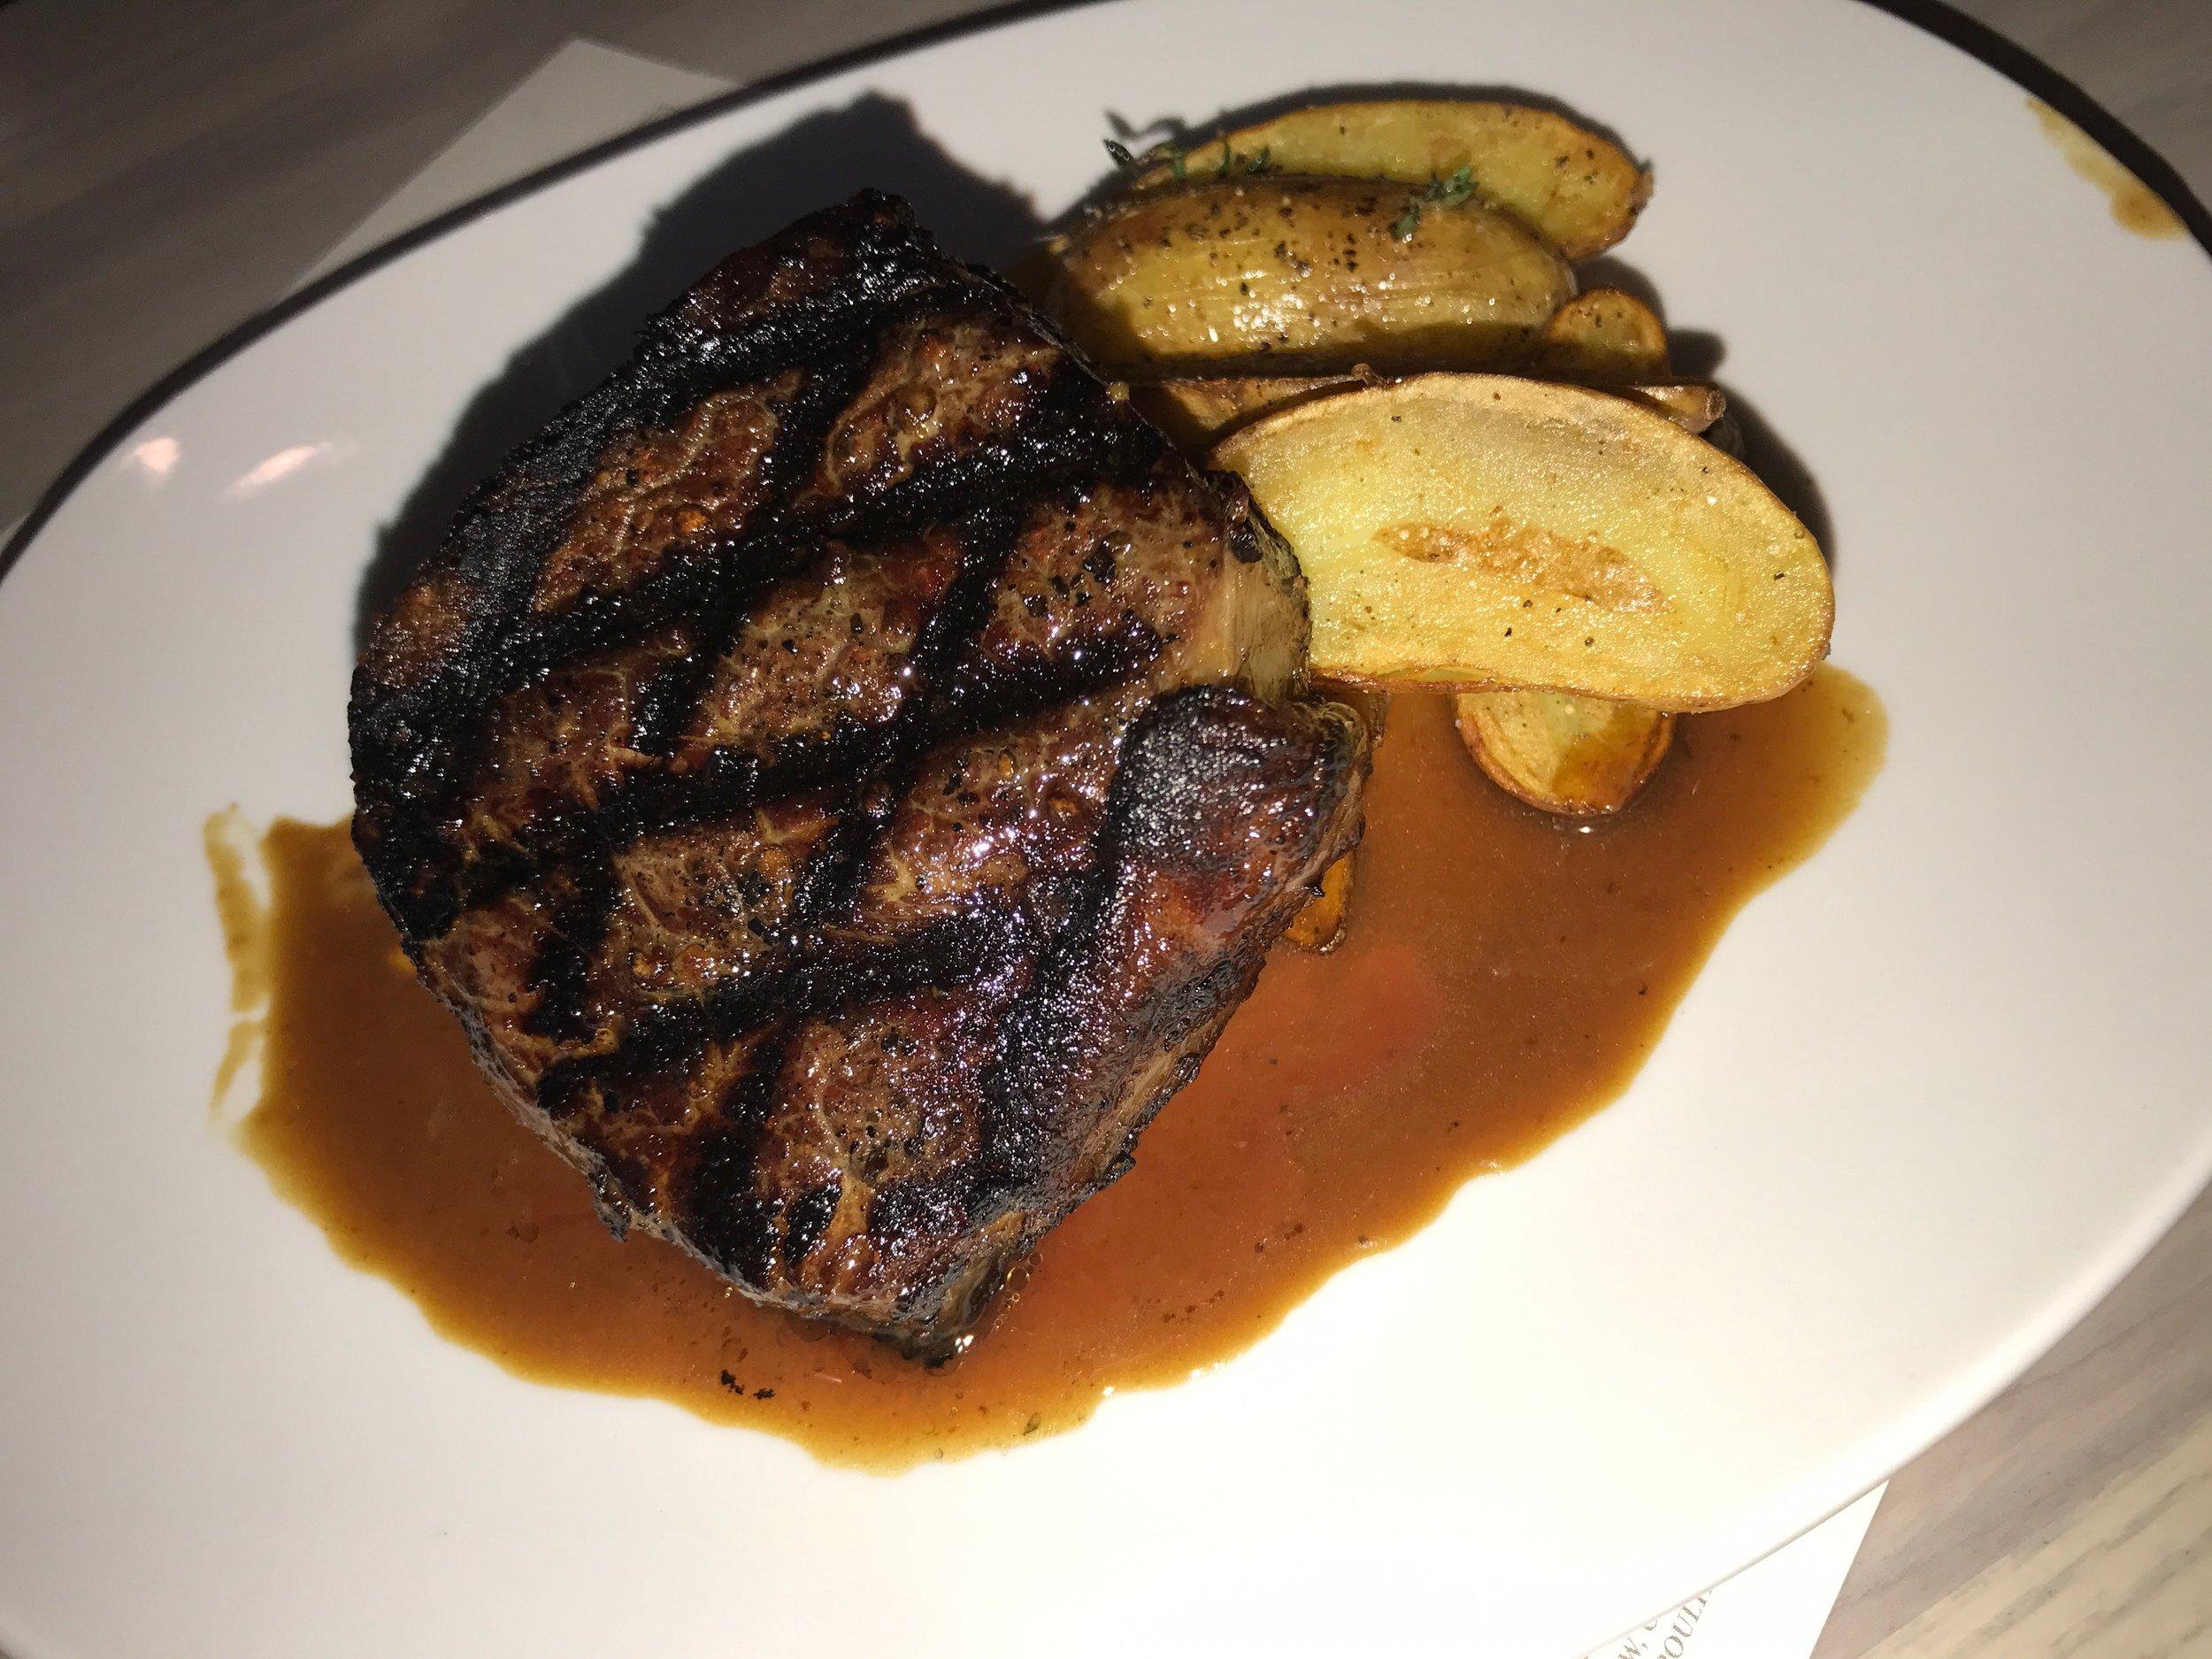 Steak (Molasses Peppercorn, Fingerlings, Onion & Fennel, Bourbon Demi)